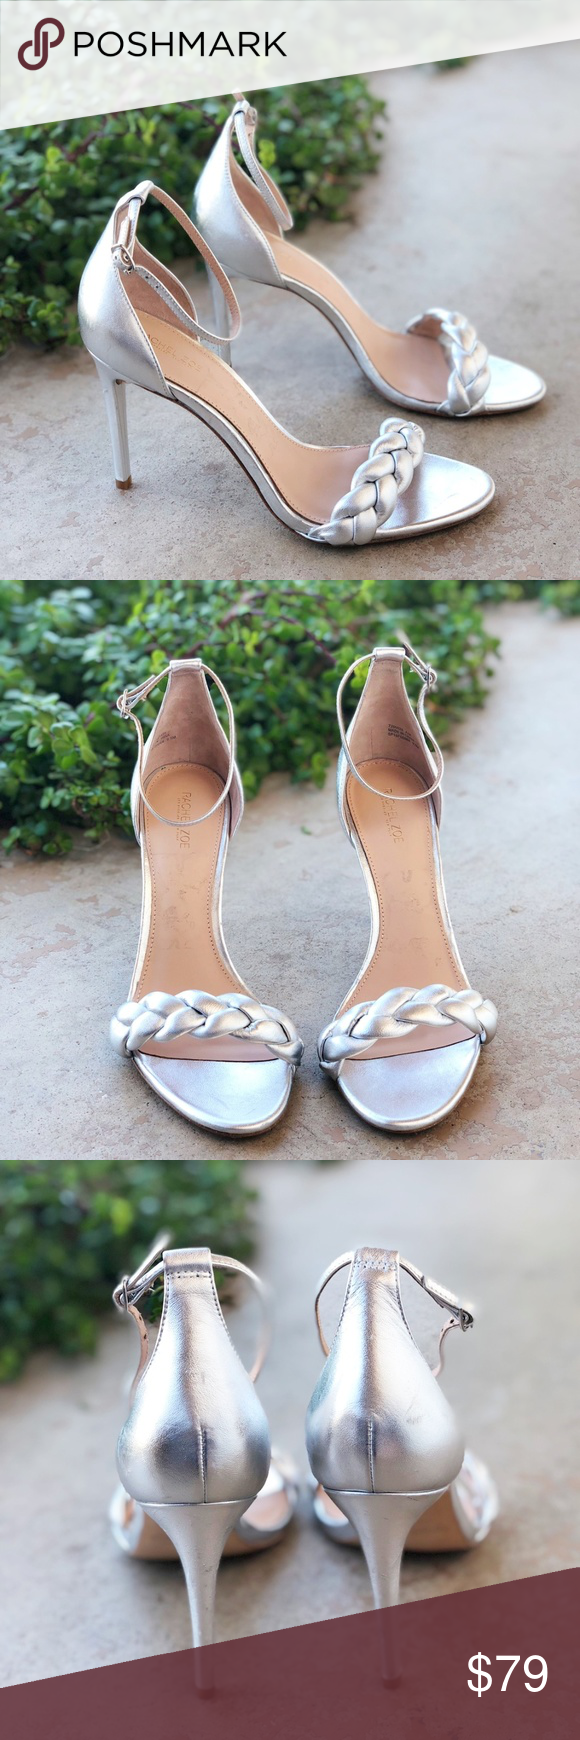 b564a766502 Rachel Zoe Ashton Silver Metallic Braided Heels Features  Silver metallic  color